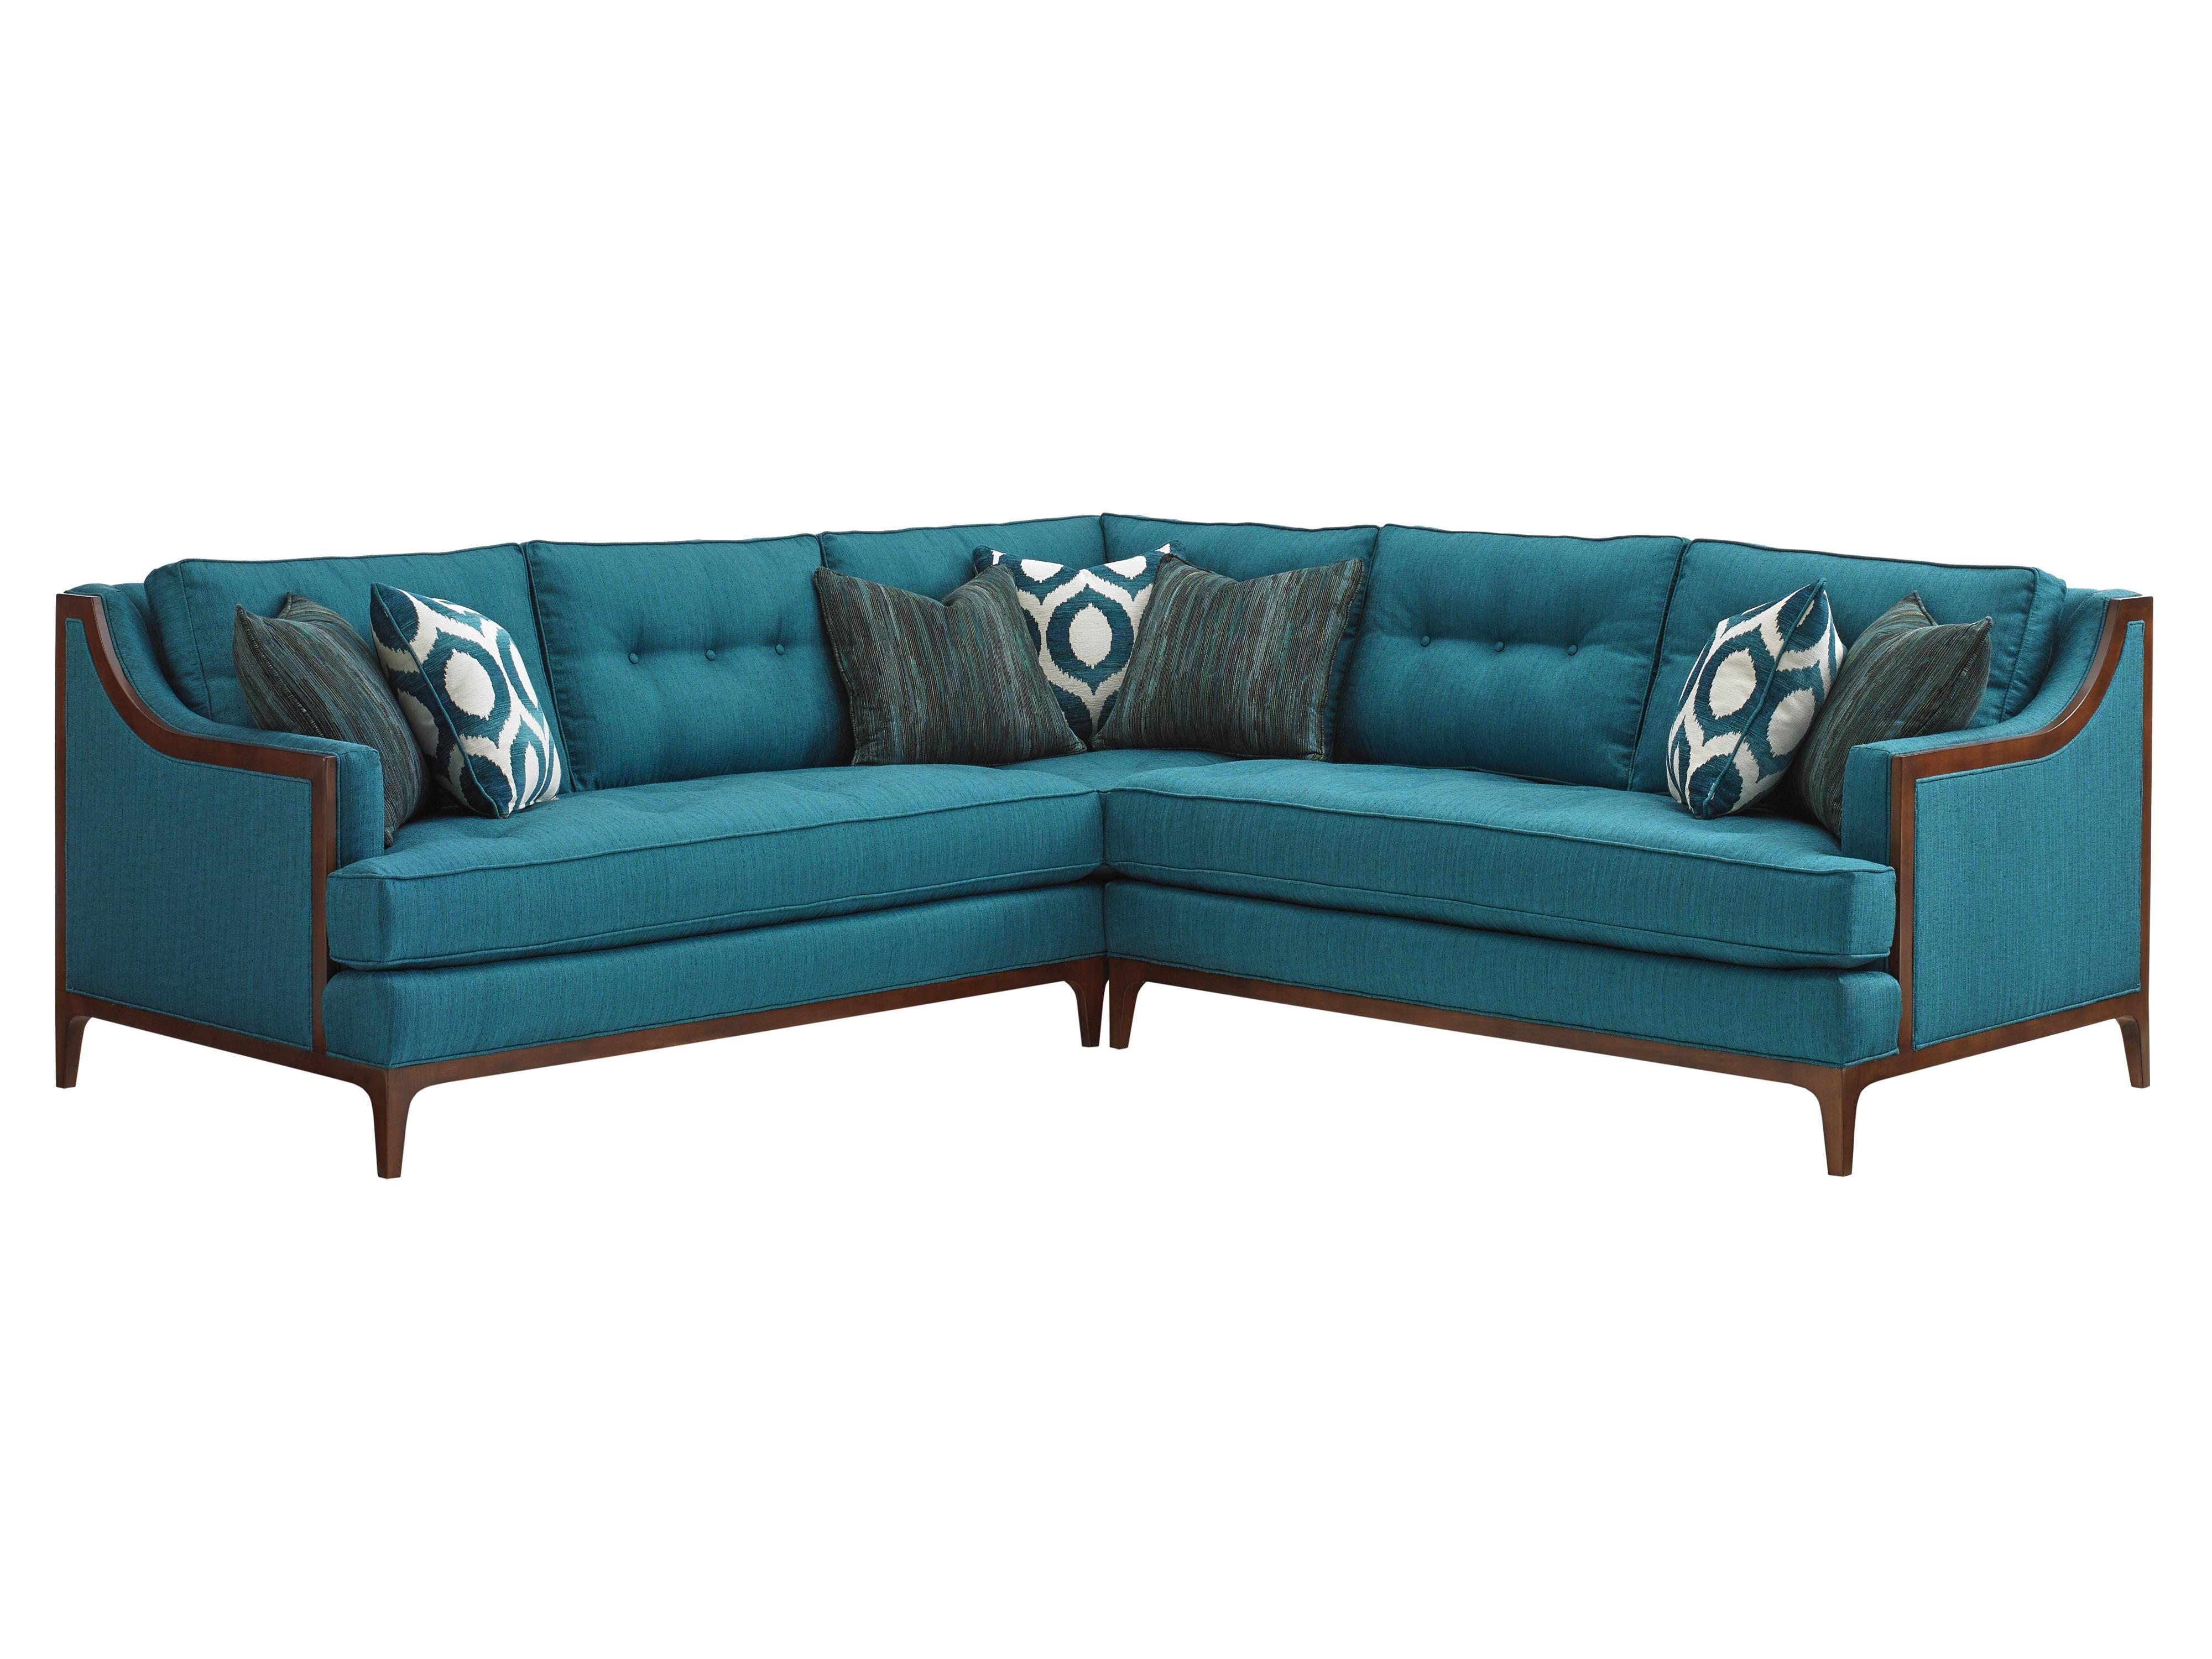 TAKE FIVE Barclay Sectional Sofa by Lexington